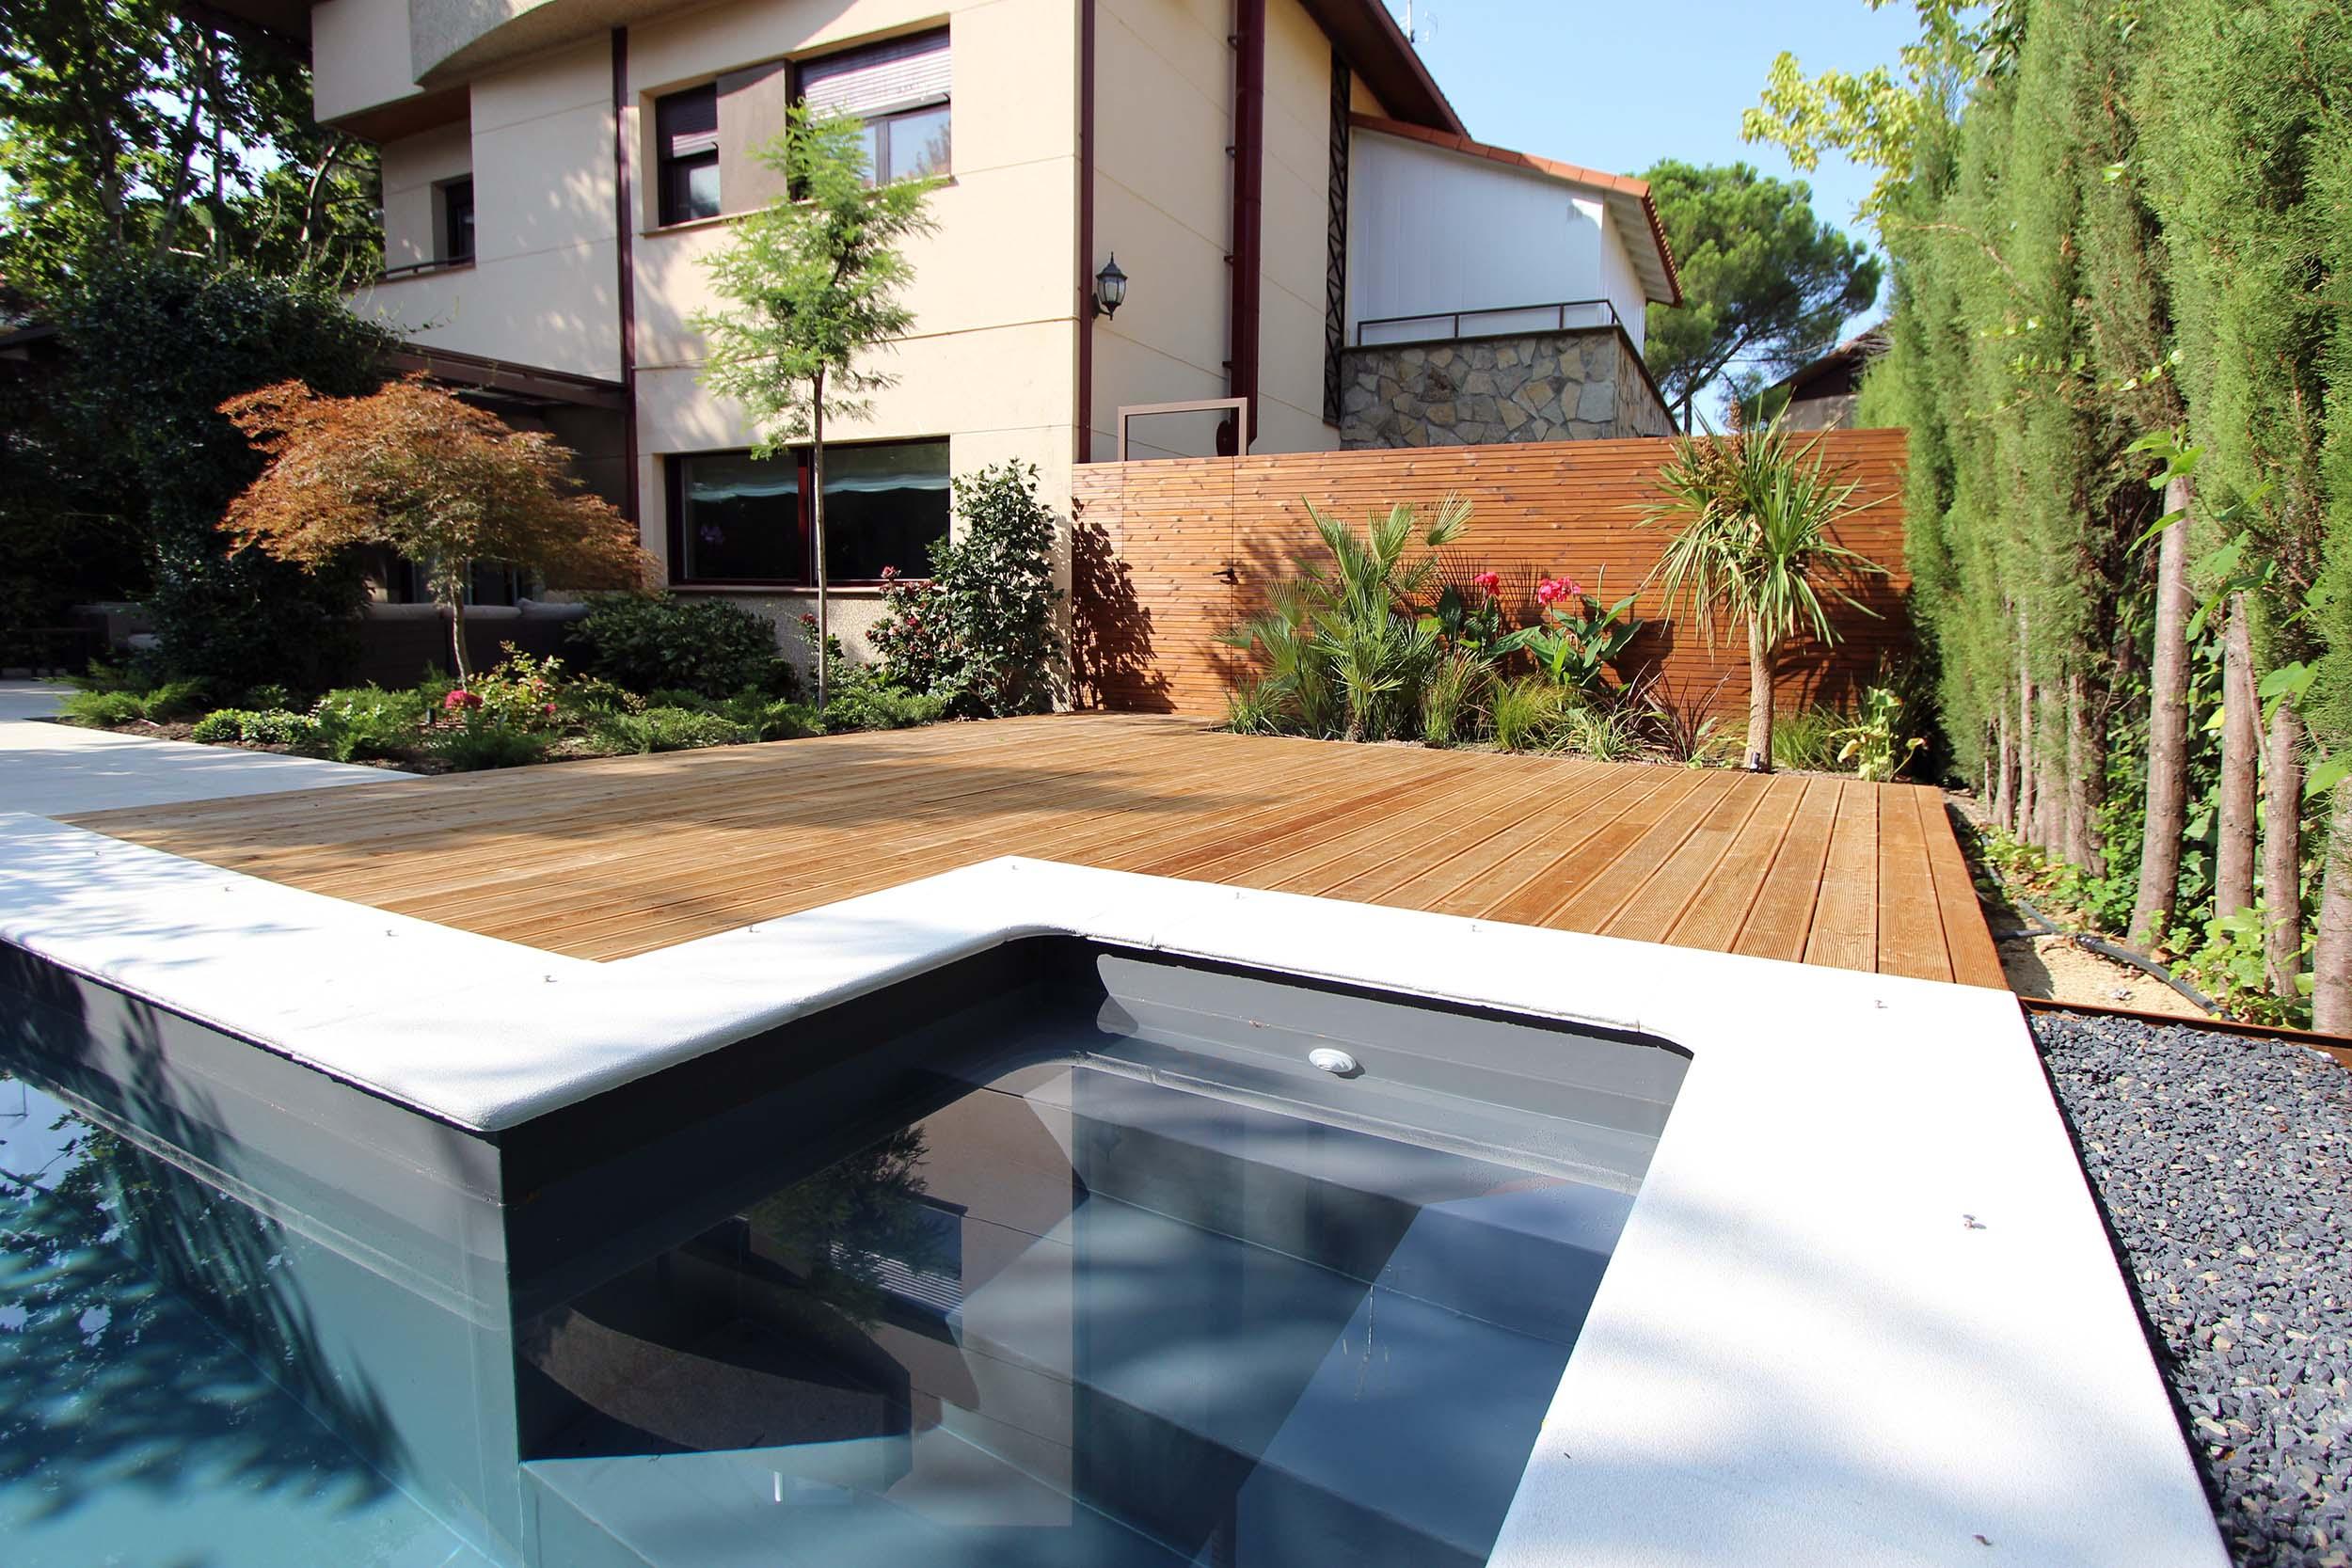 Piscinas de dise o para jardines peque os un jardin para mi Disenos de albercas en patios pequenos